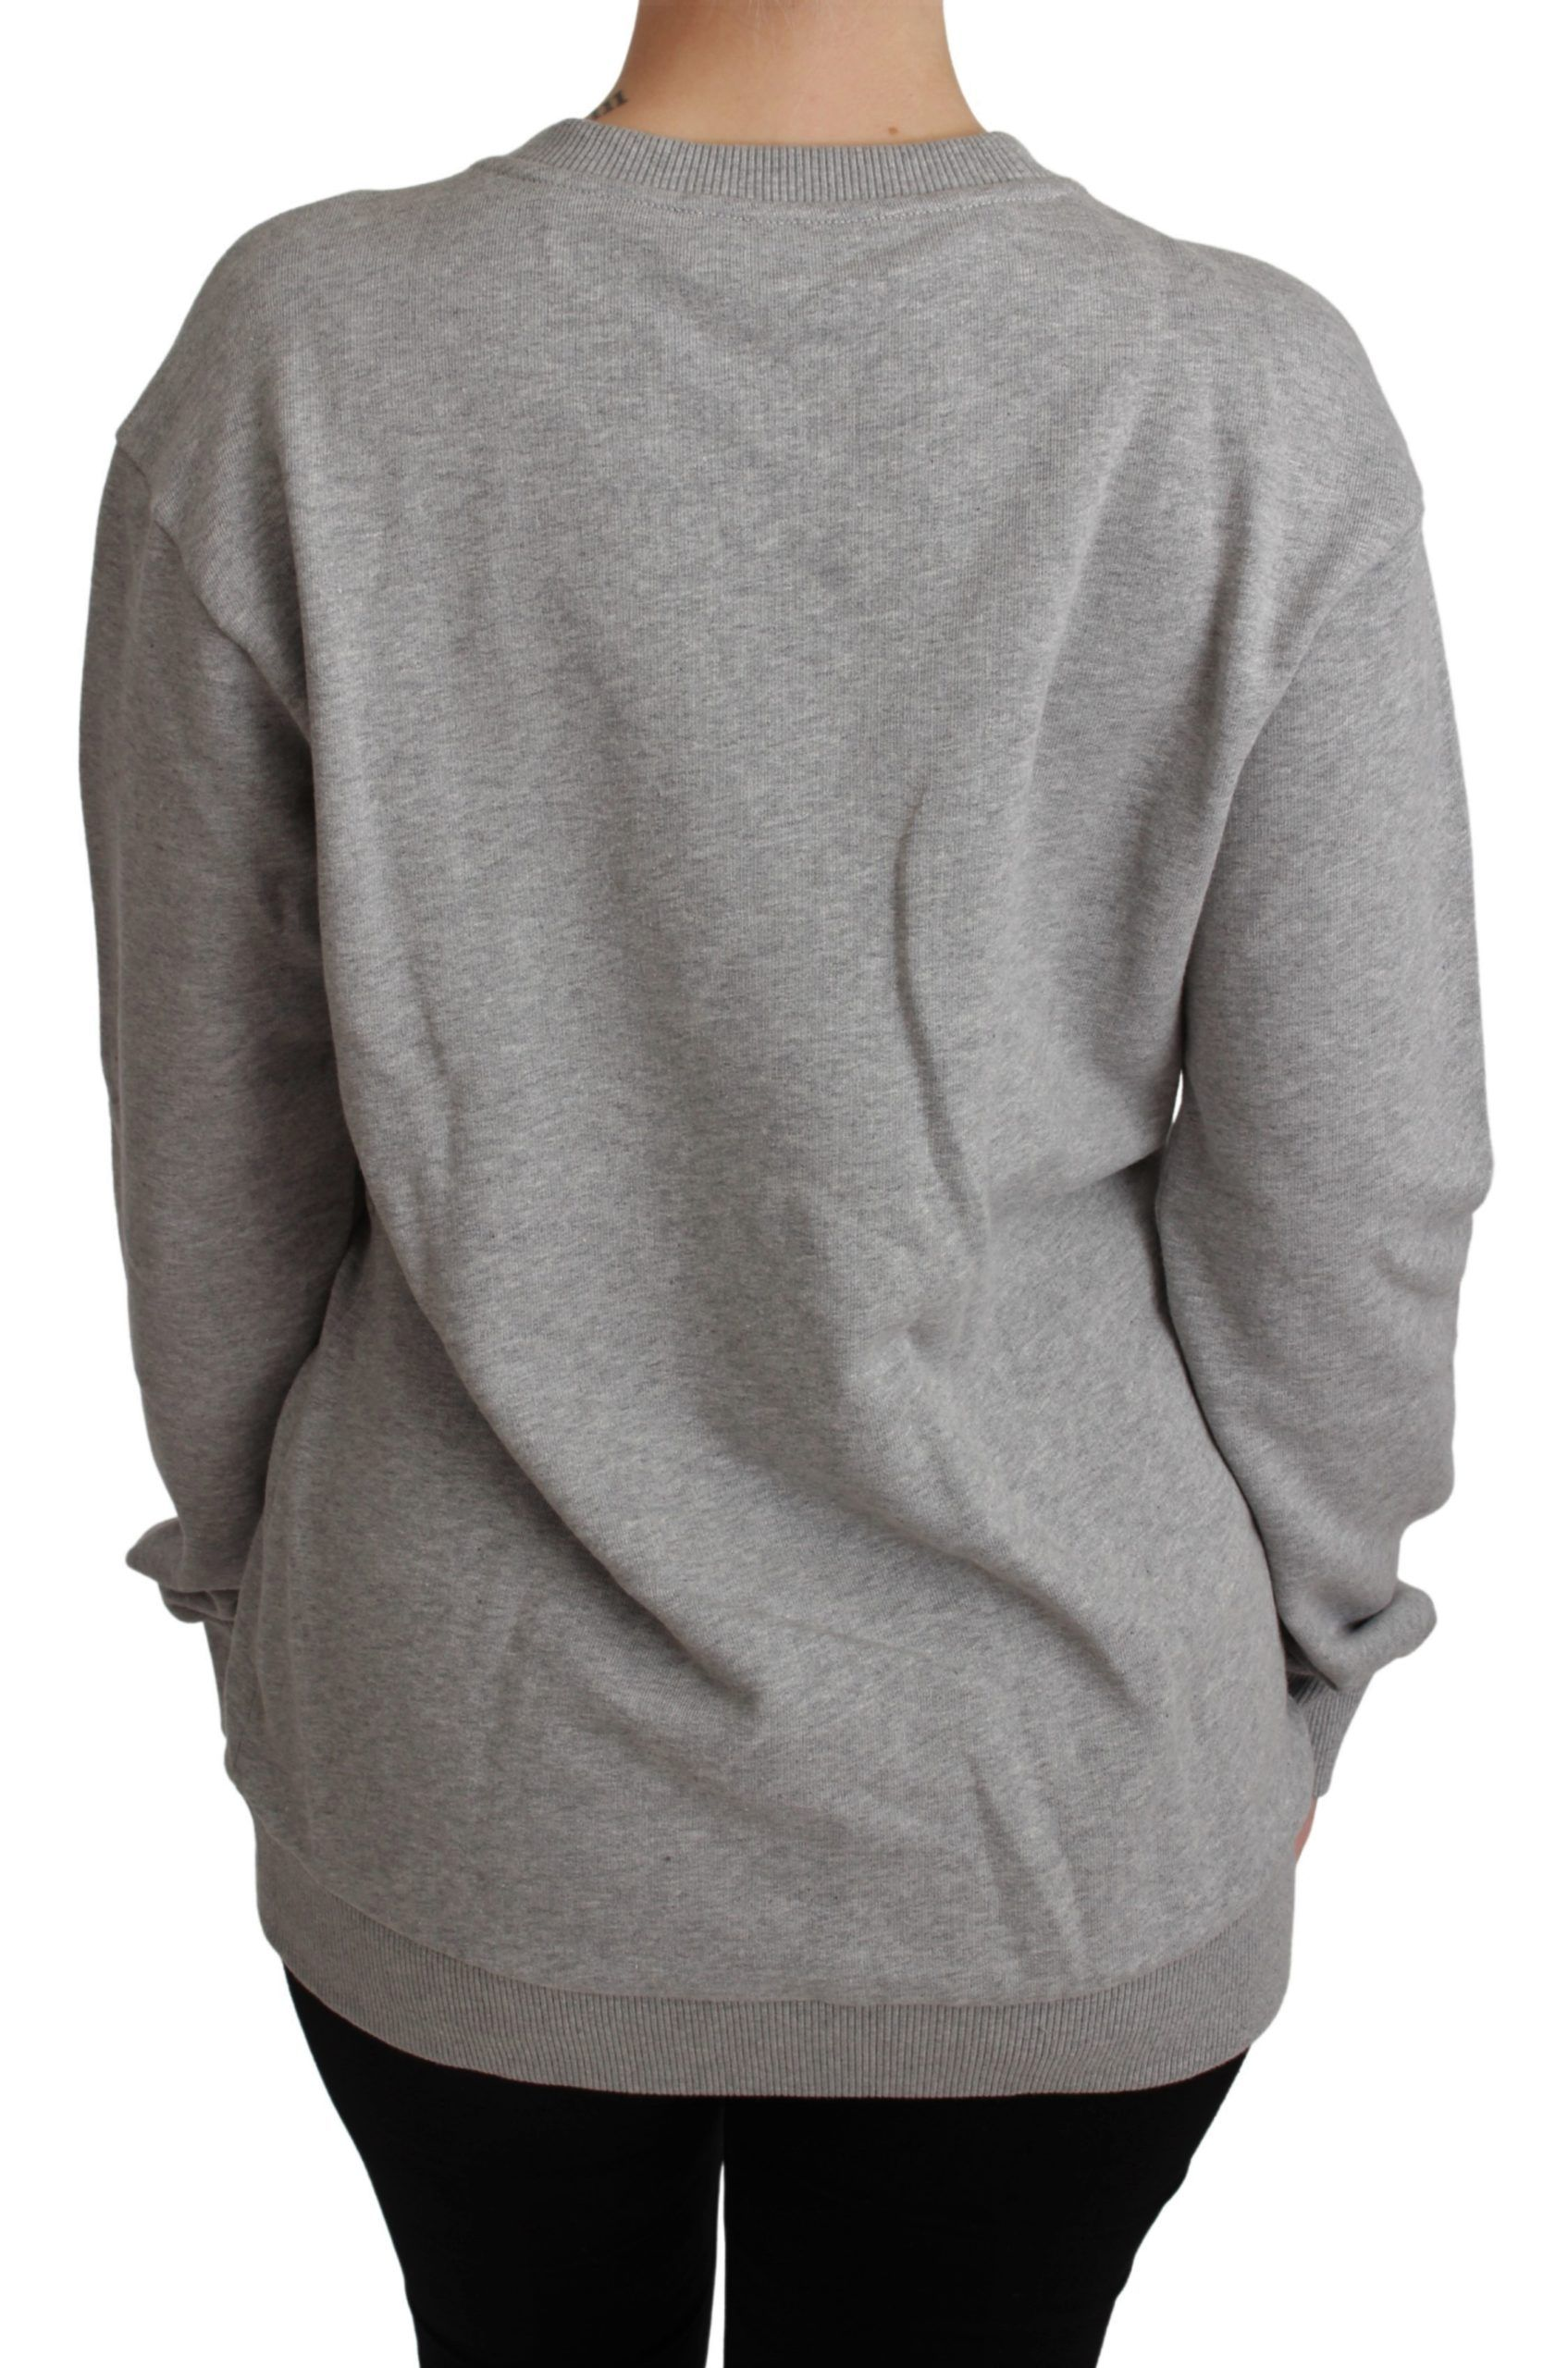 Ermenegildo Zegna Gray Striped Two Piece 3 Button Wool Suit